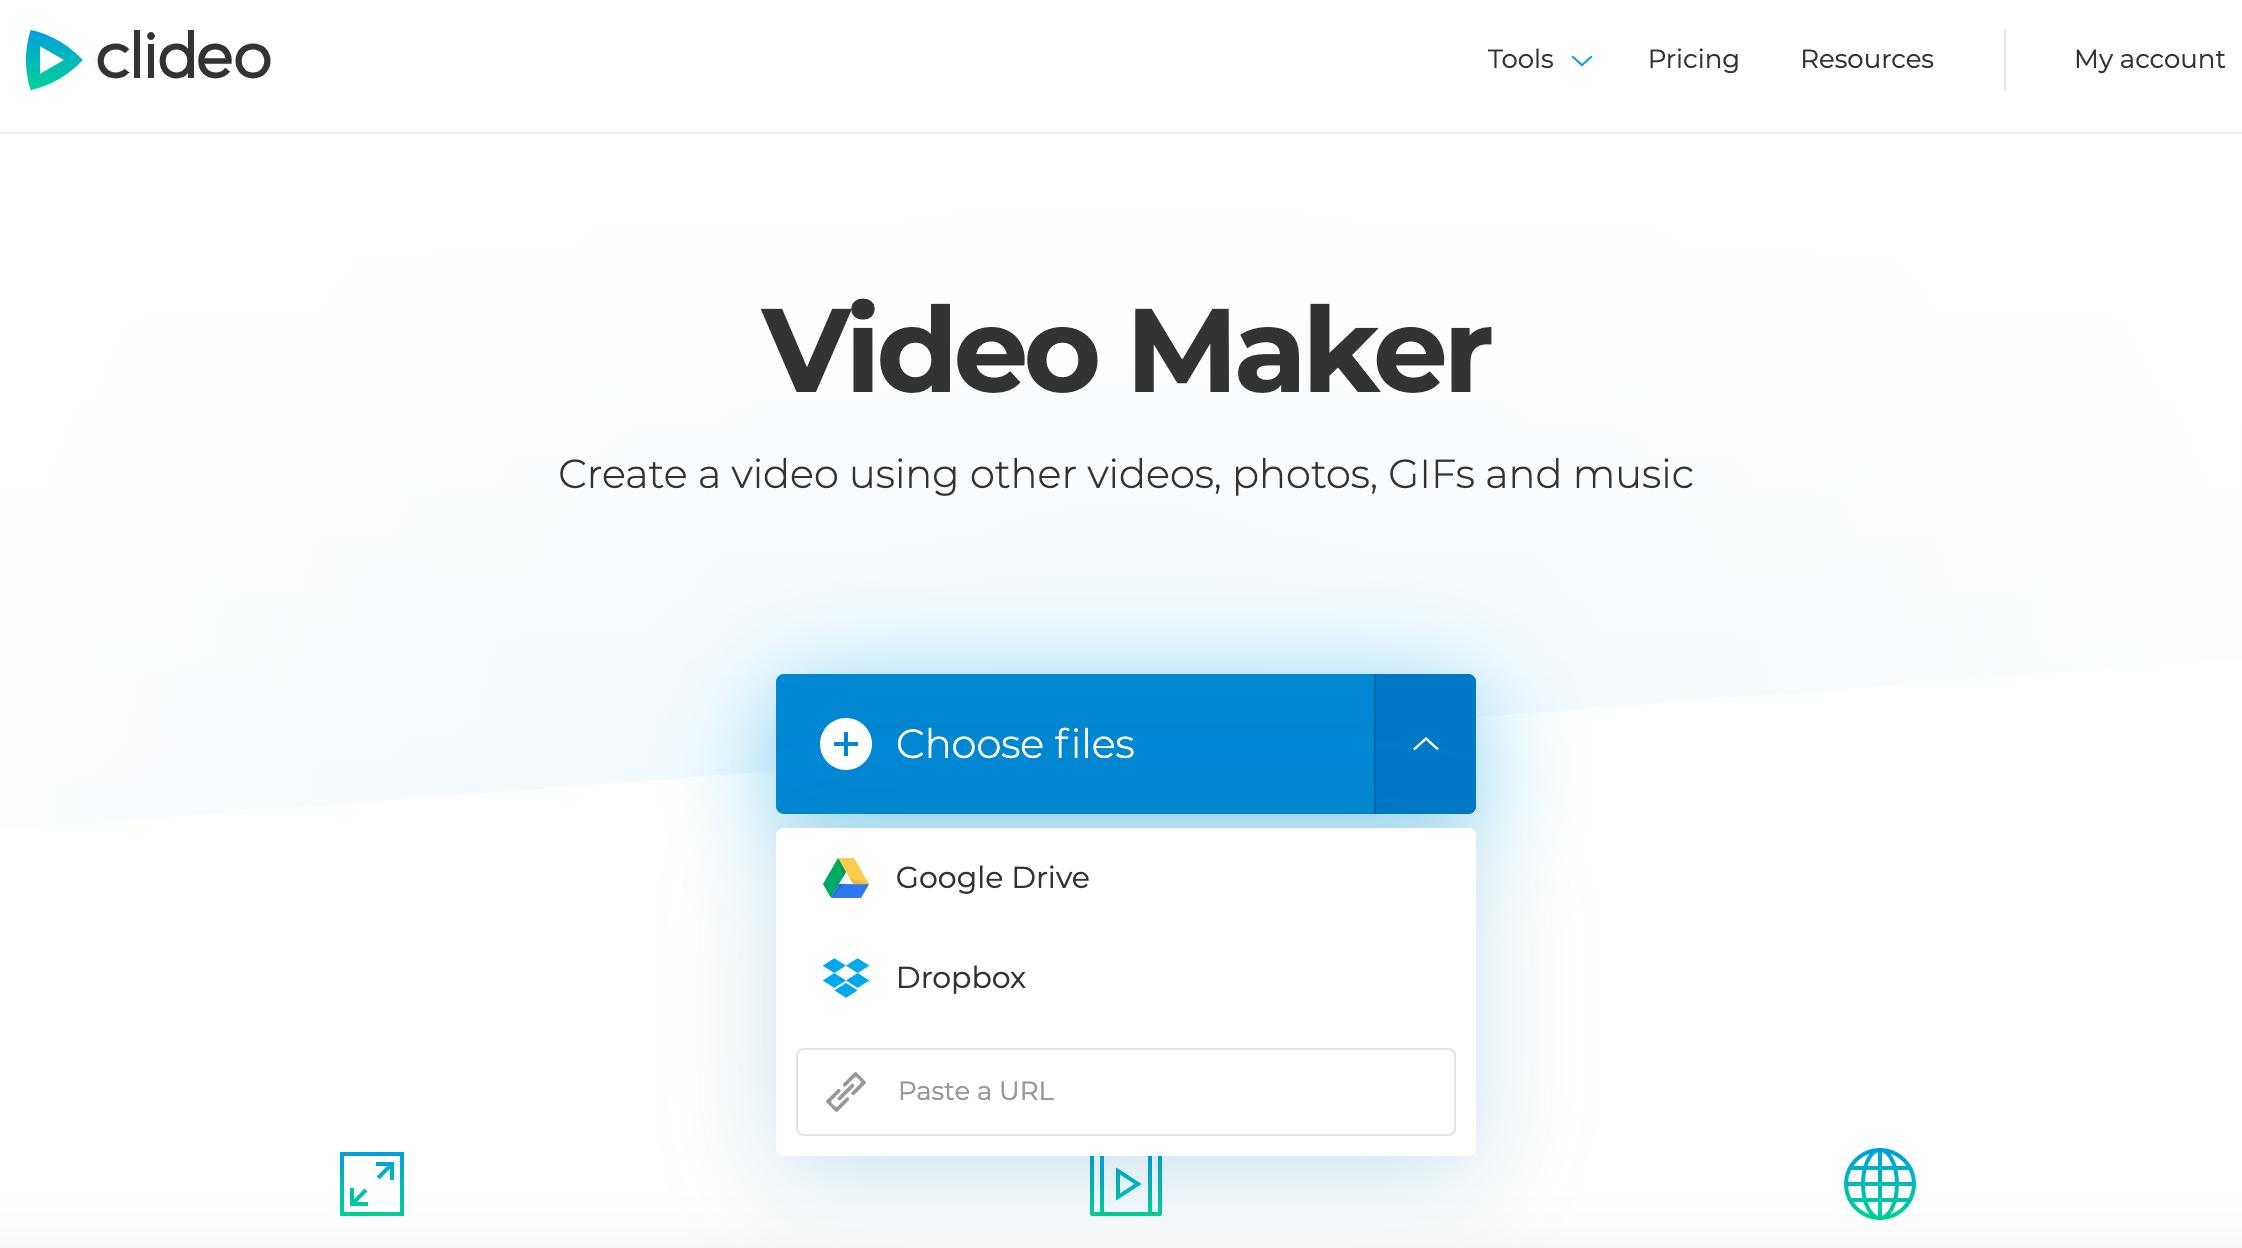 Choose files to create a Facebook video